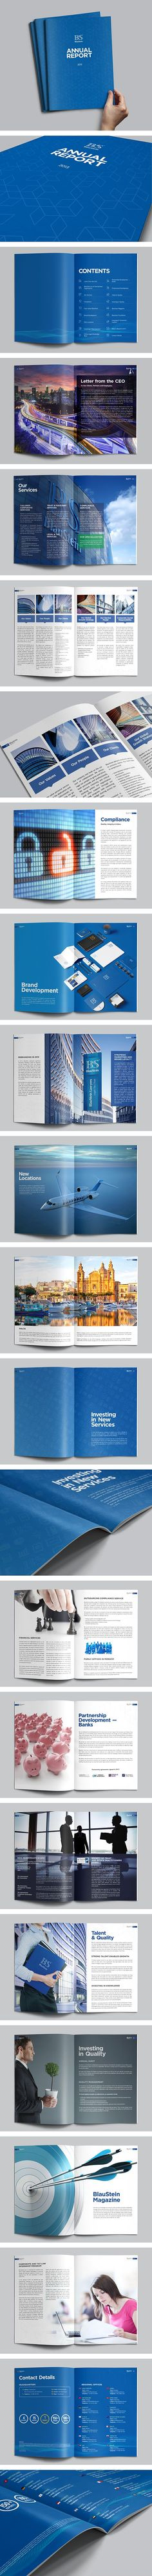 BlauStein Annual Report 2013 by Sergey Vasilev, via Behance: